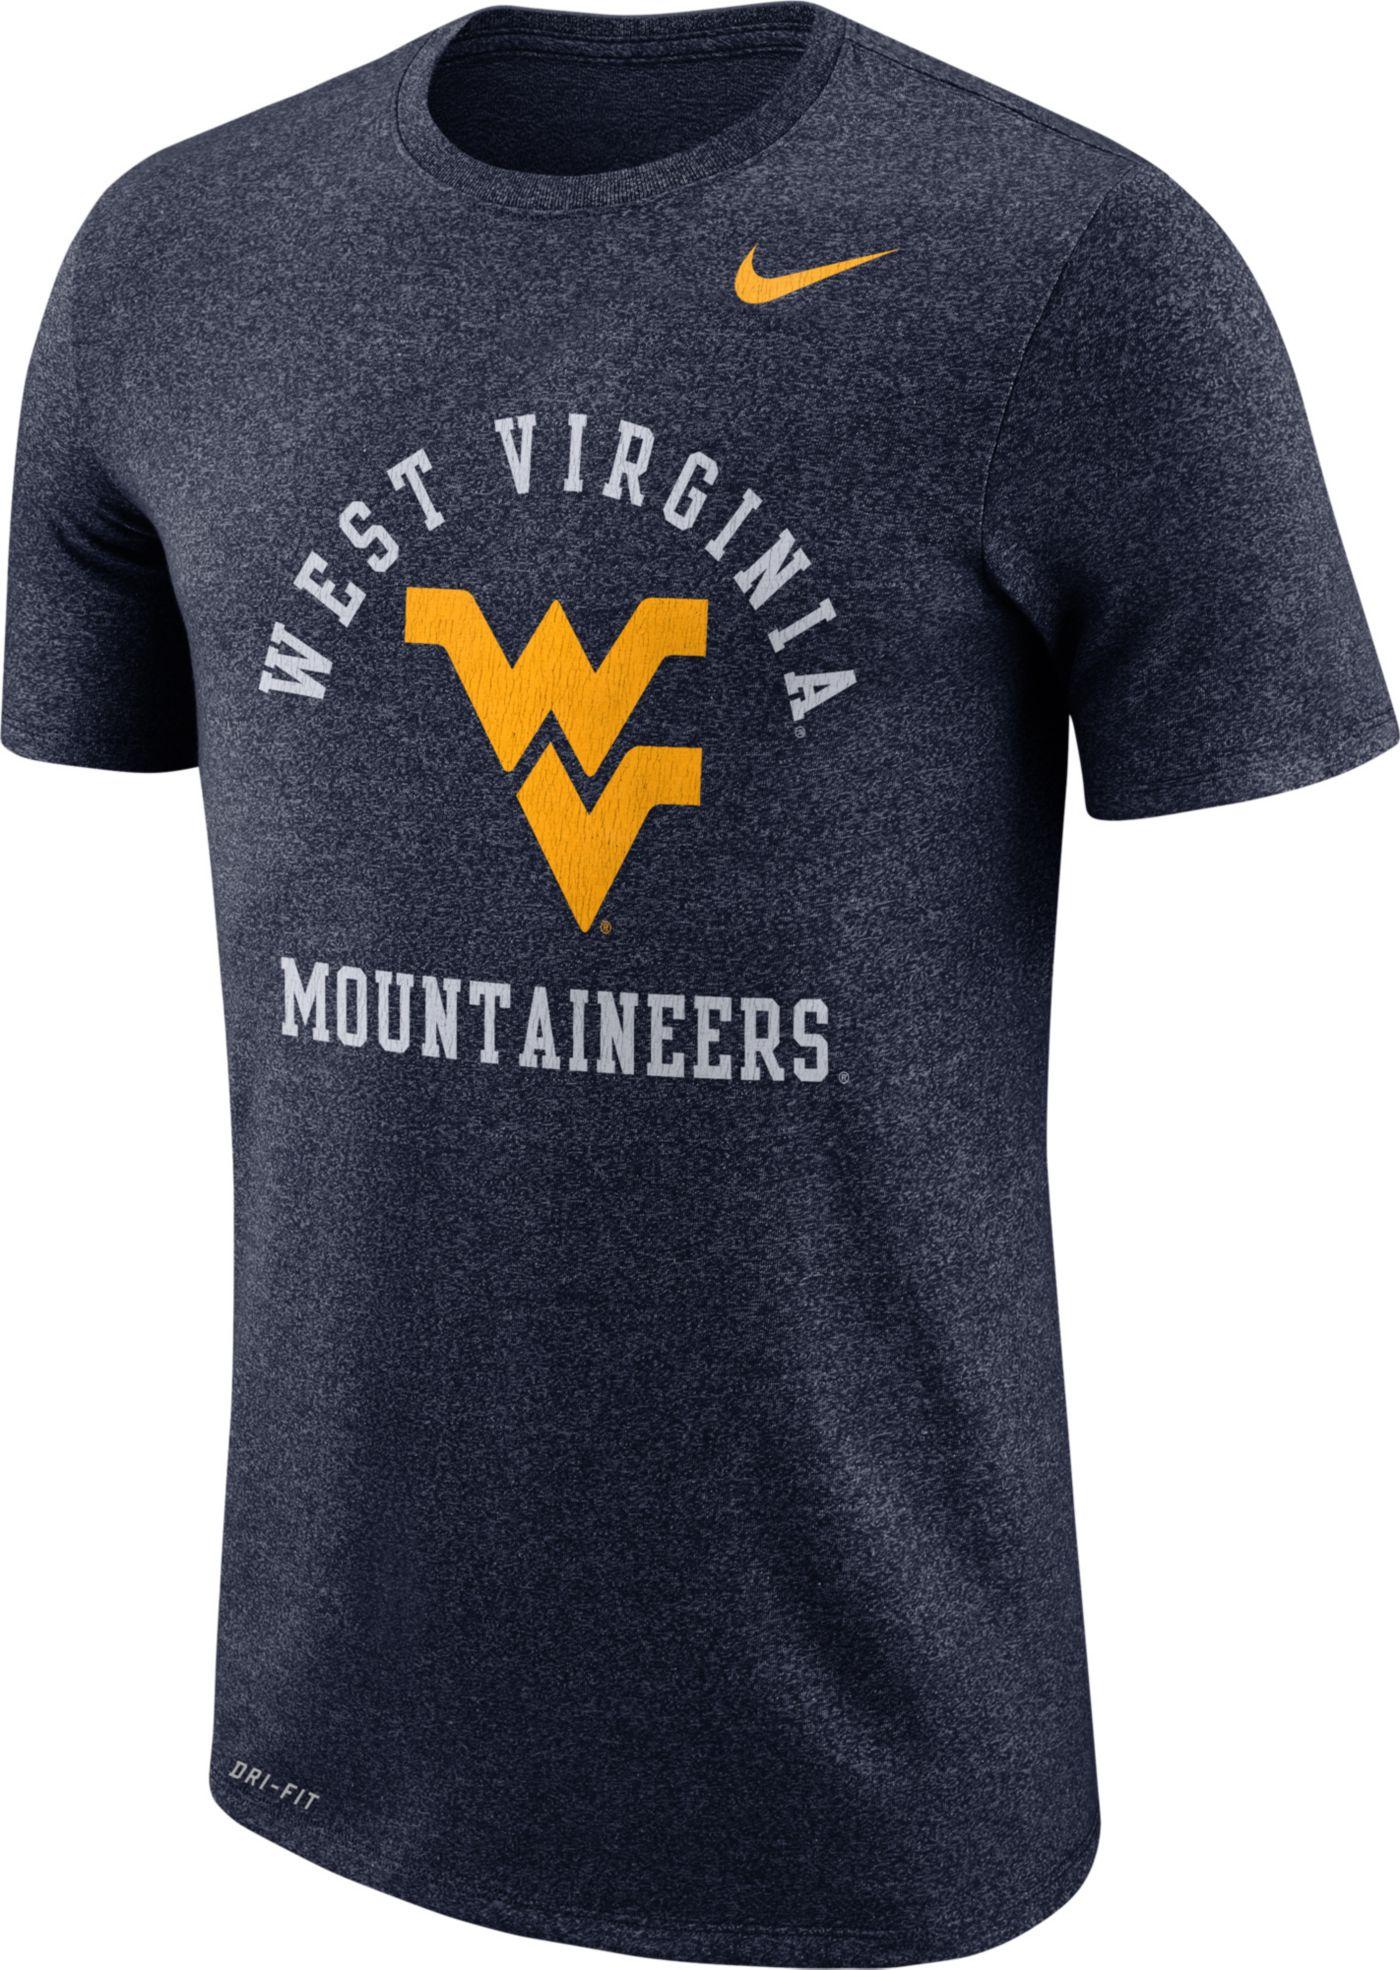 Nike Men's West Virginia Mountaineers Blue Marled Raglan T-Shirt